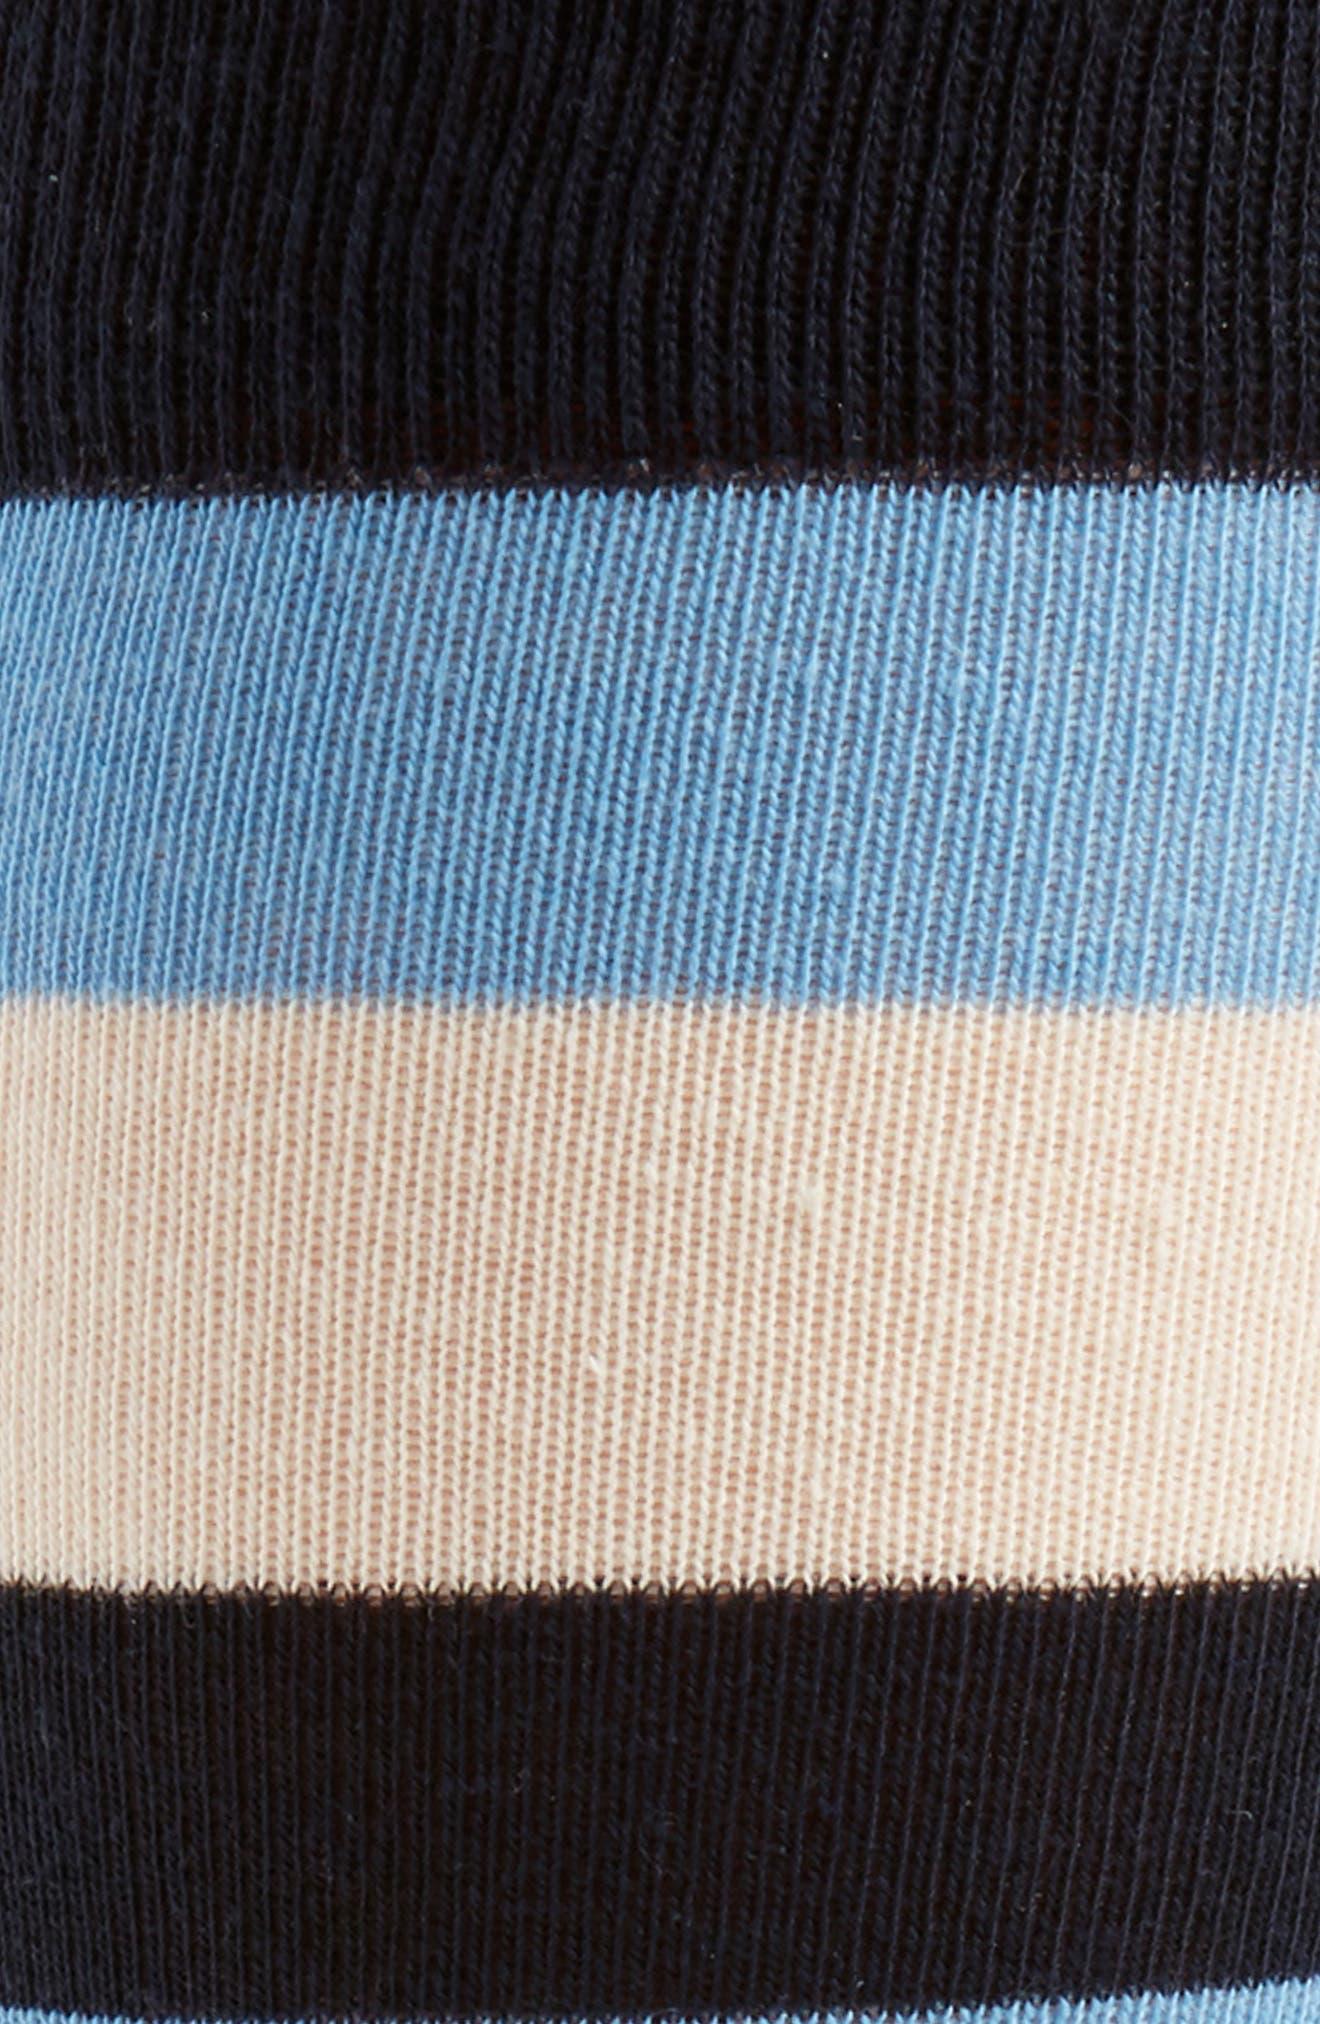 Striped Socks,                             Alternate thumbnail 2, color,                             410